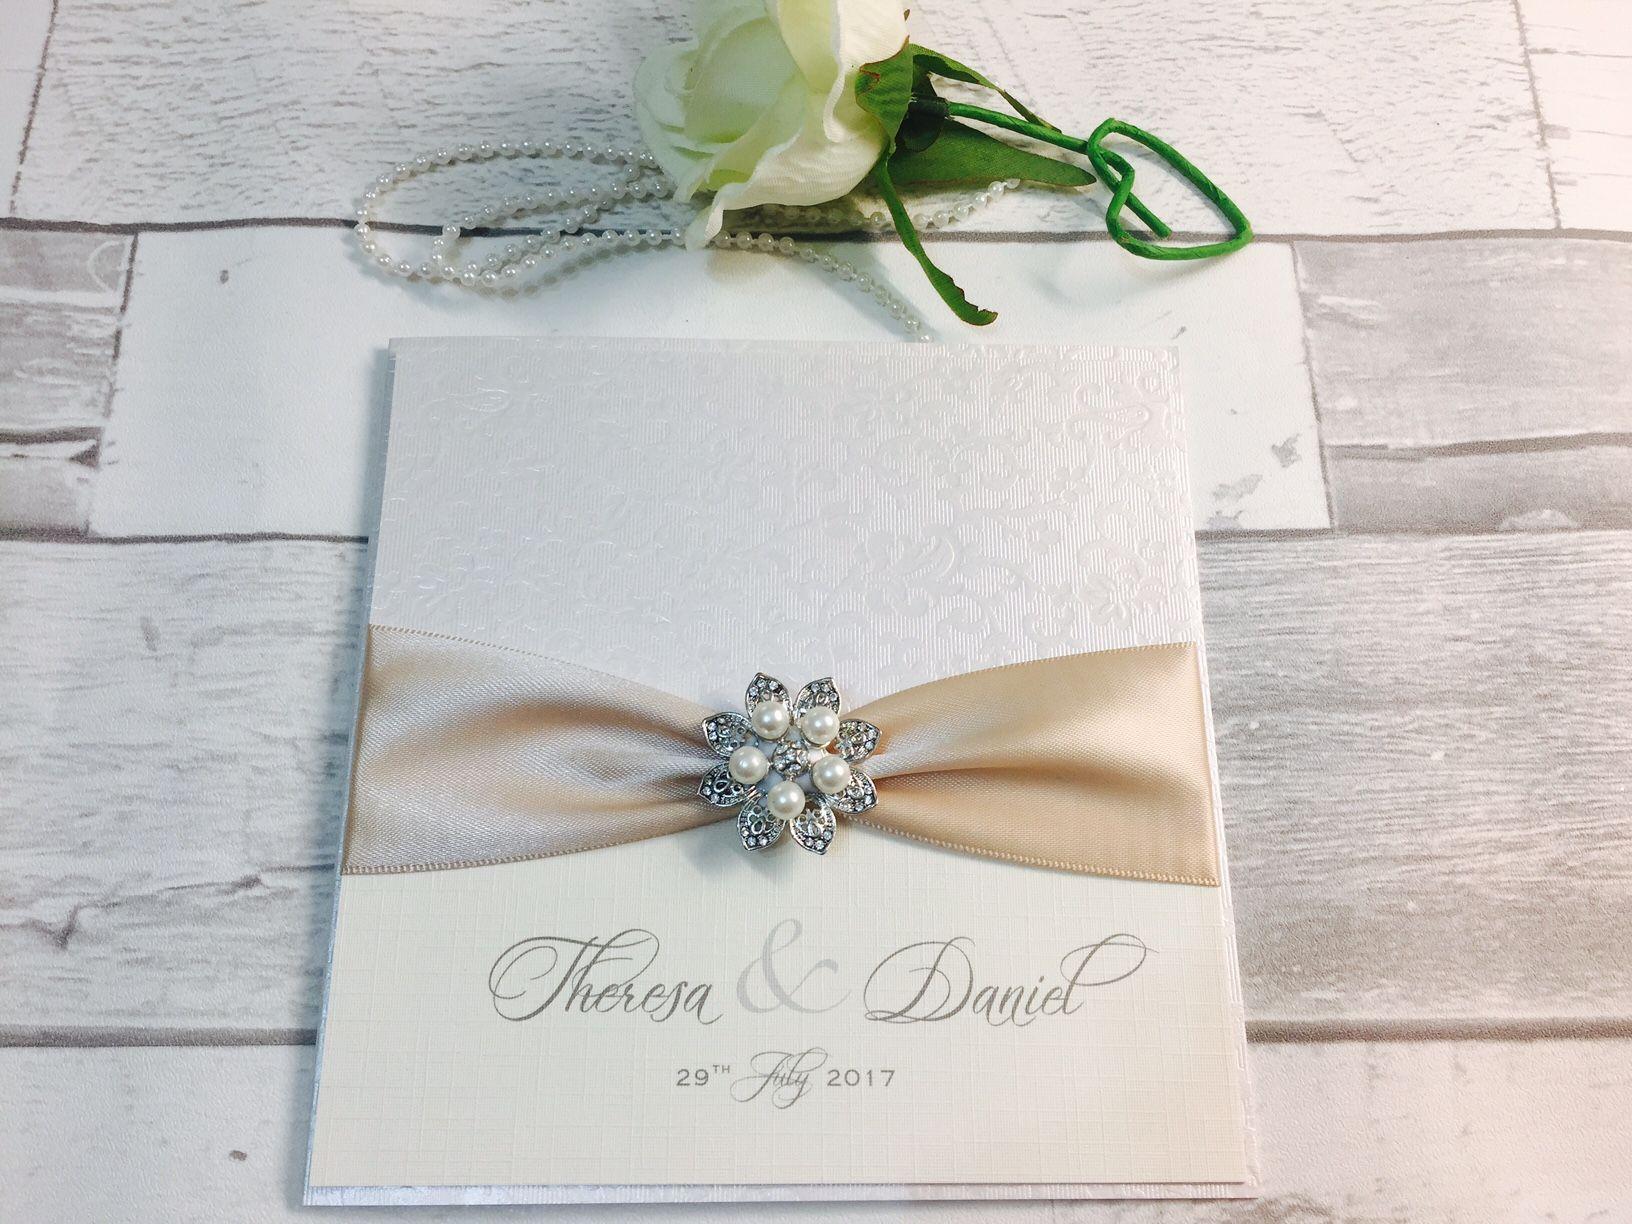 Vintage style wedding invitations UK